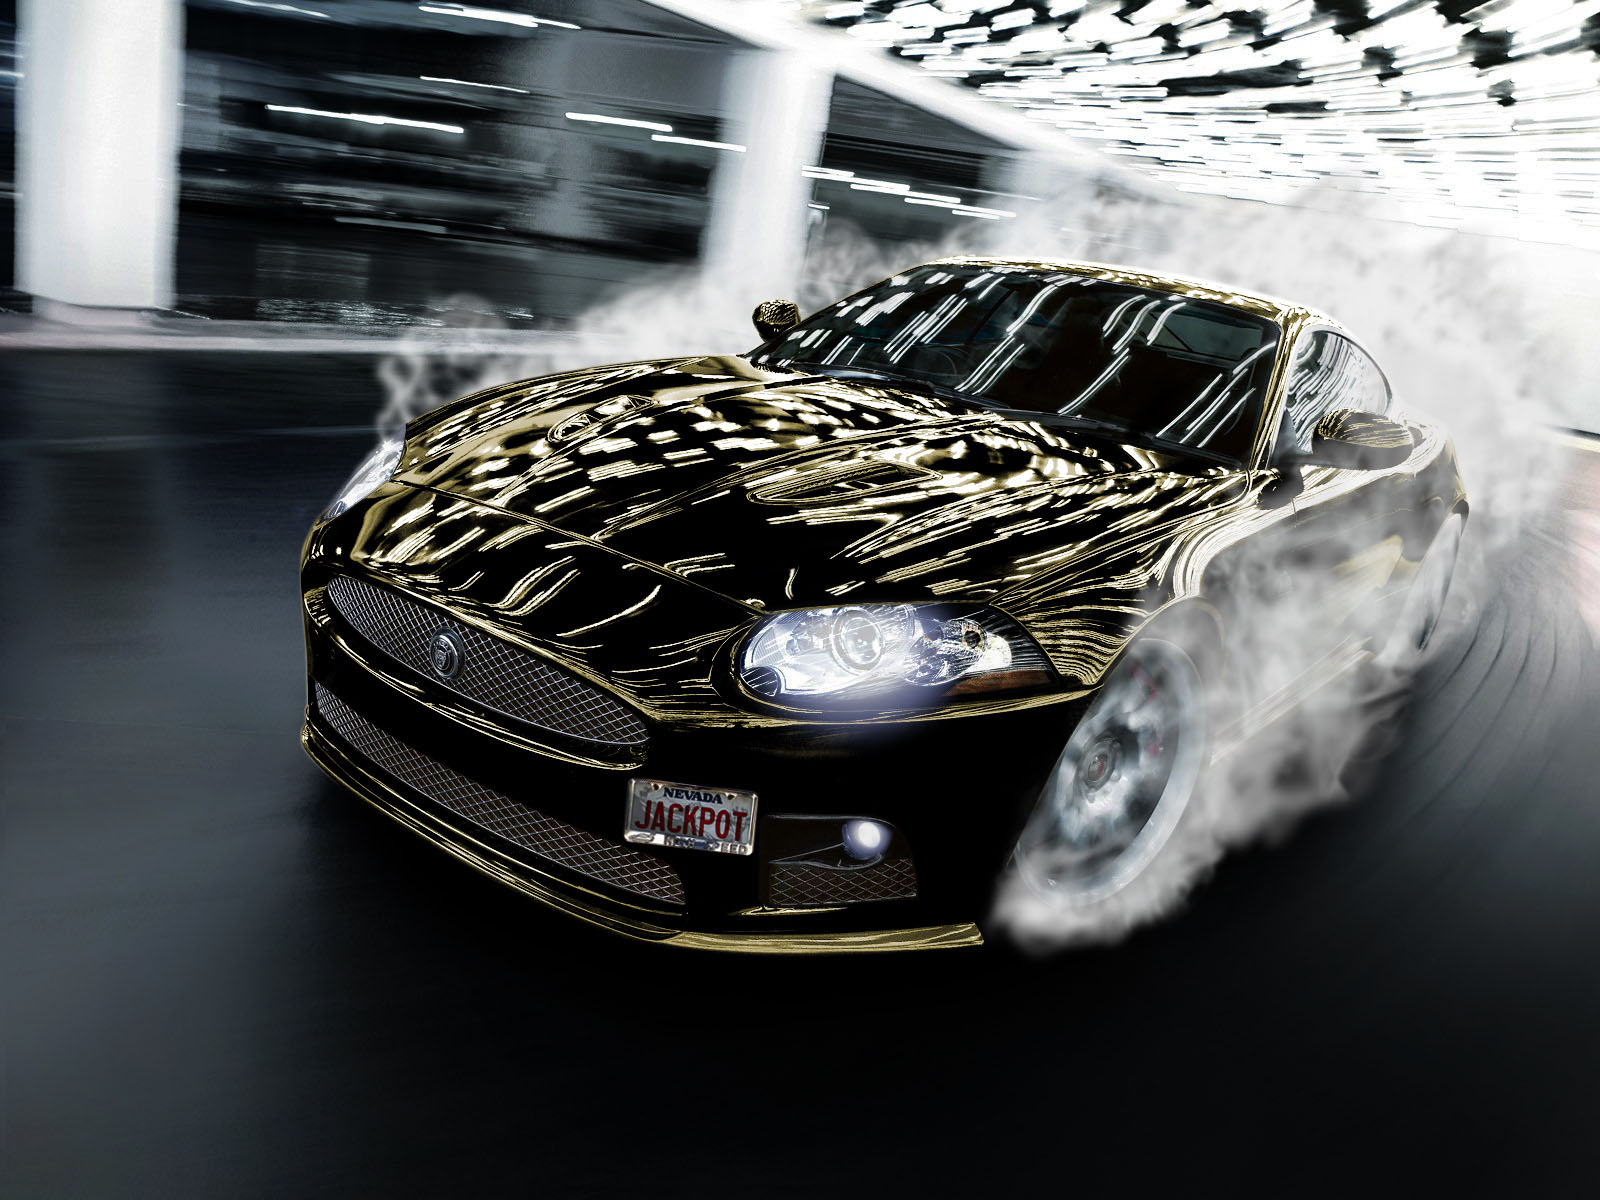 Wallpaper download jaguar - Jaguar Car Hd Wallpaper